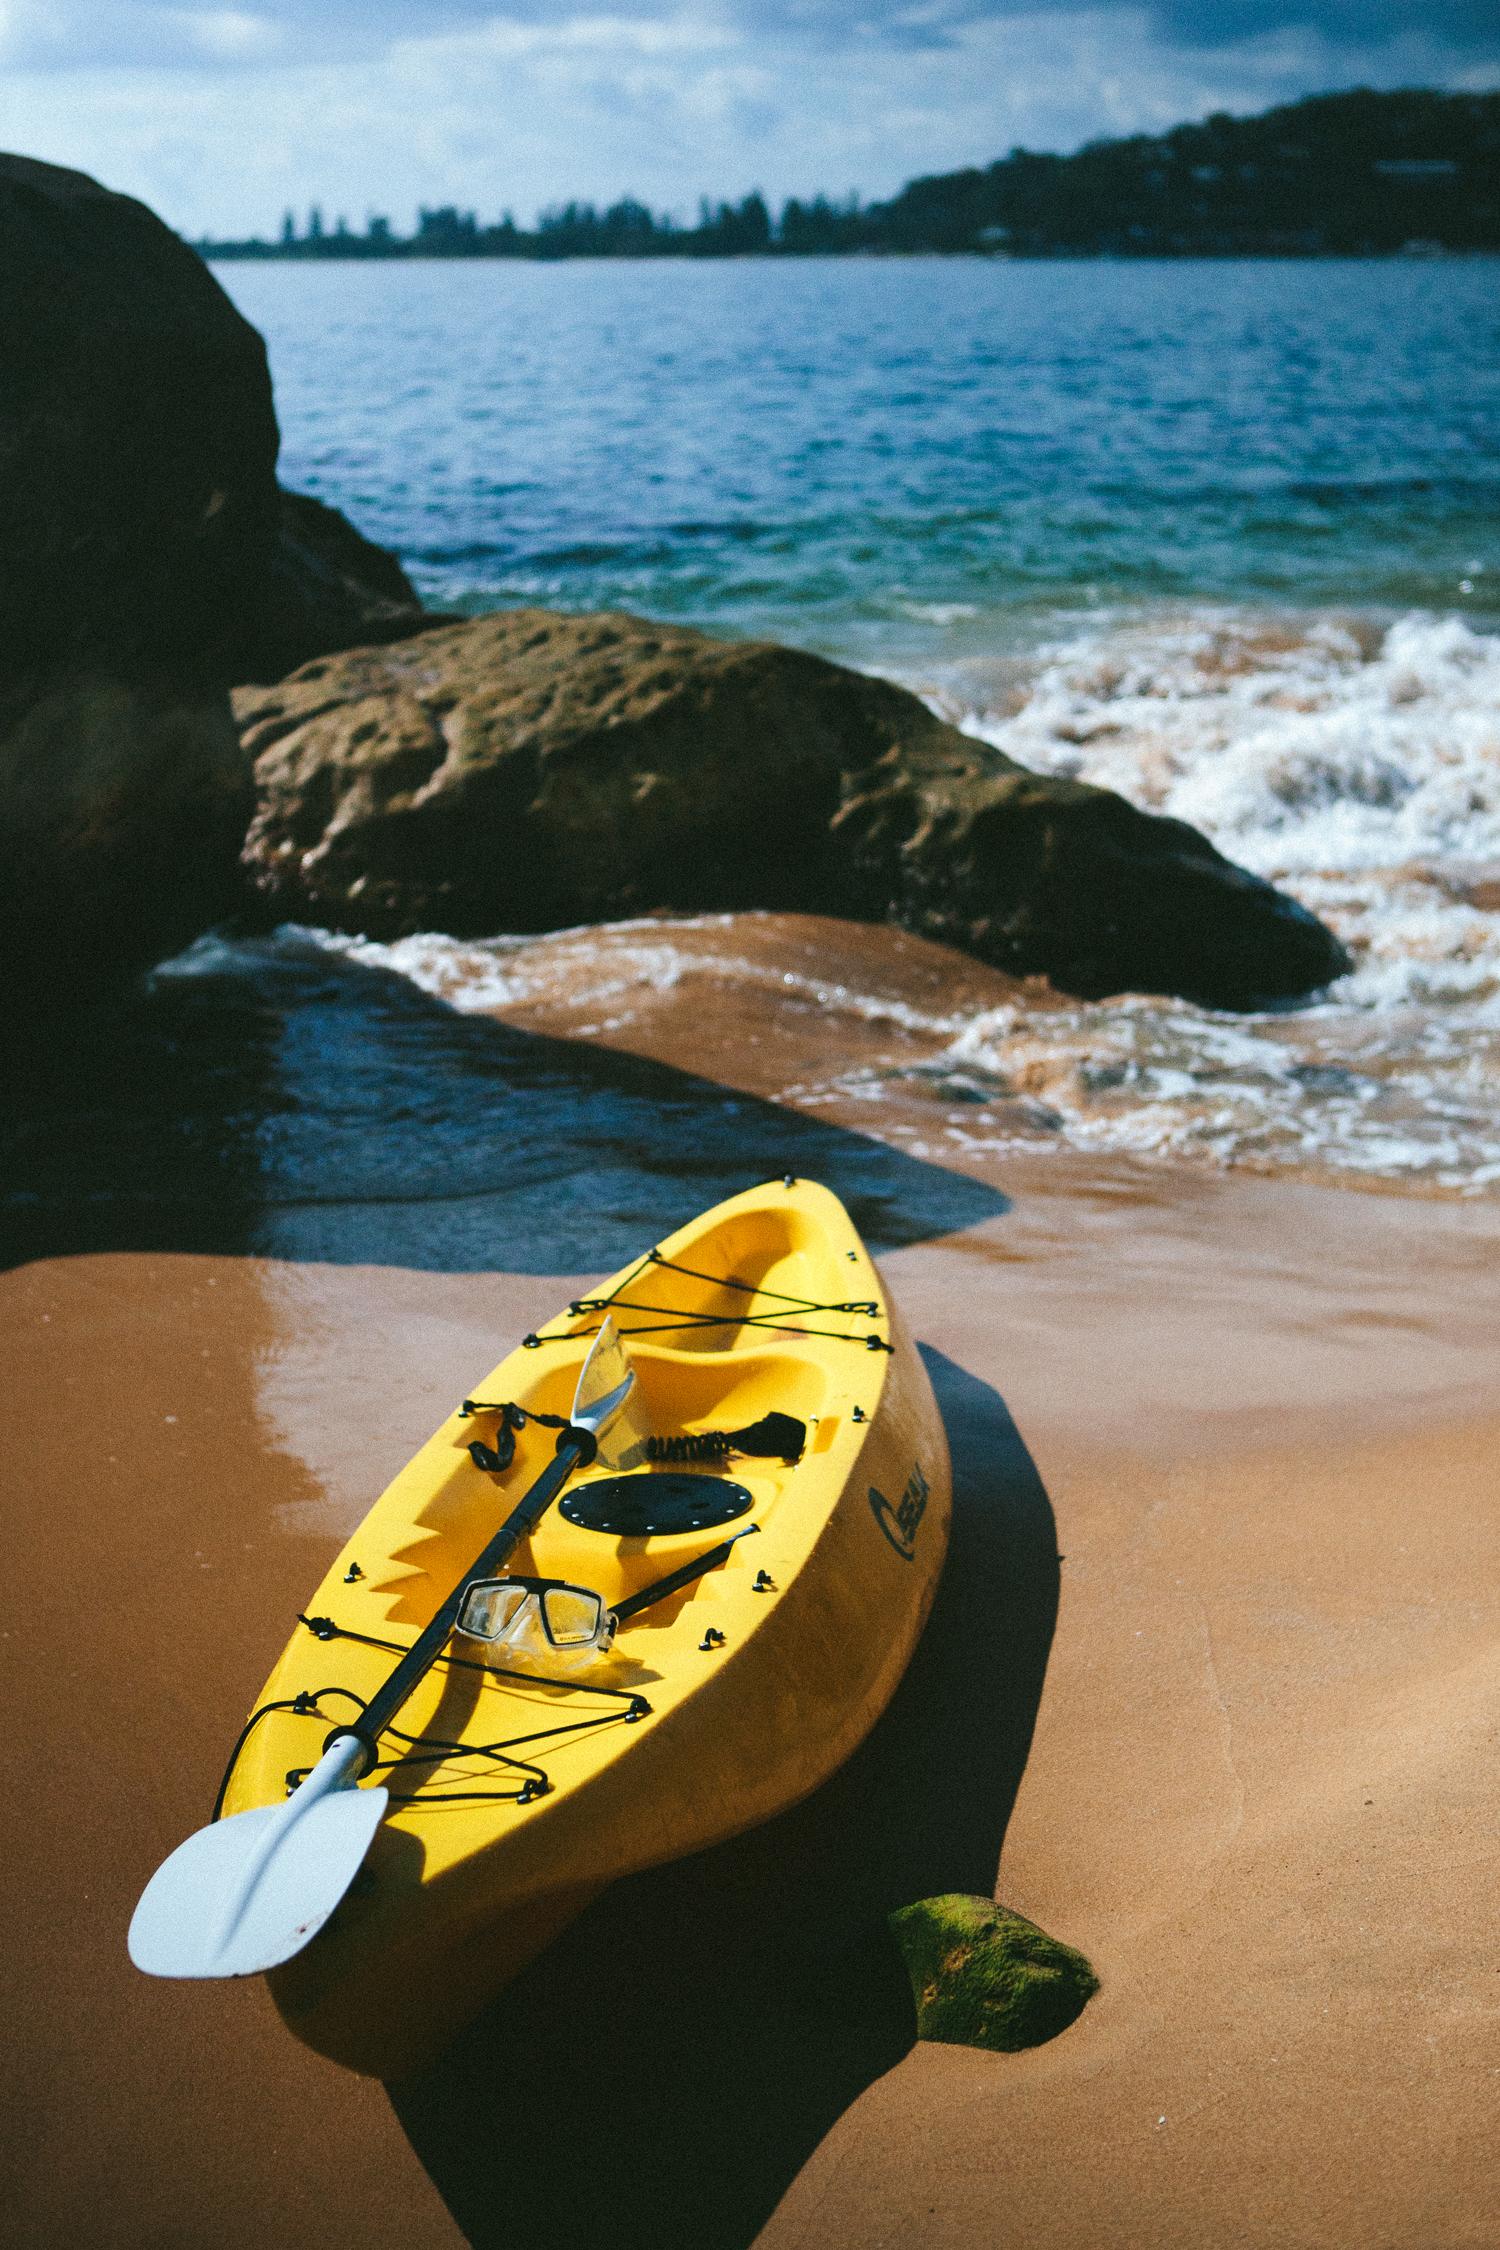 Guest kayaks